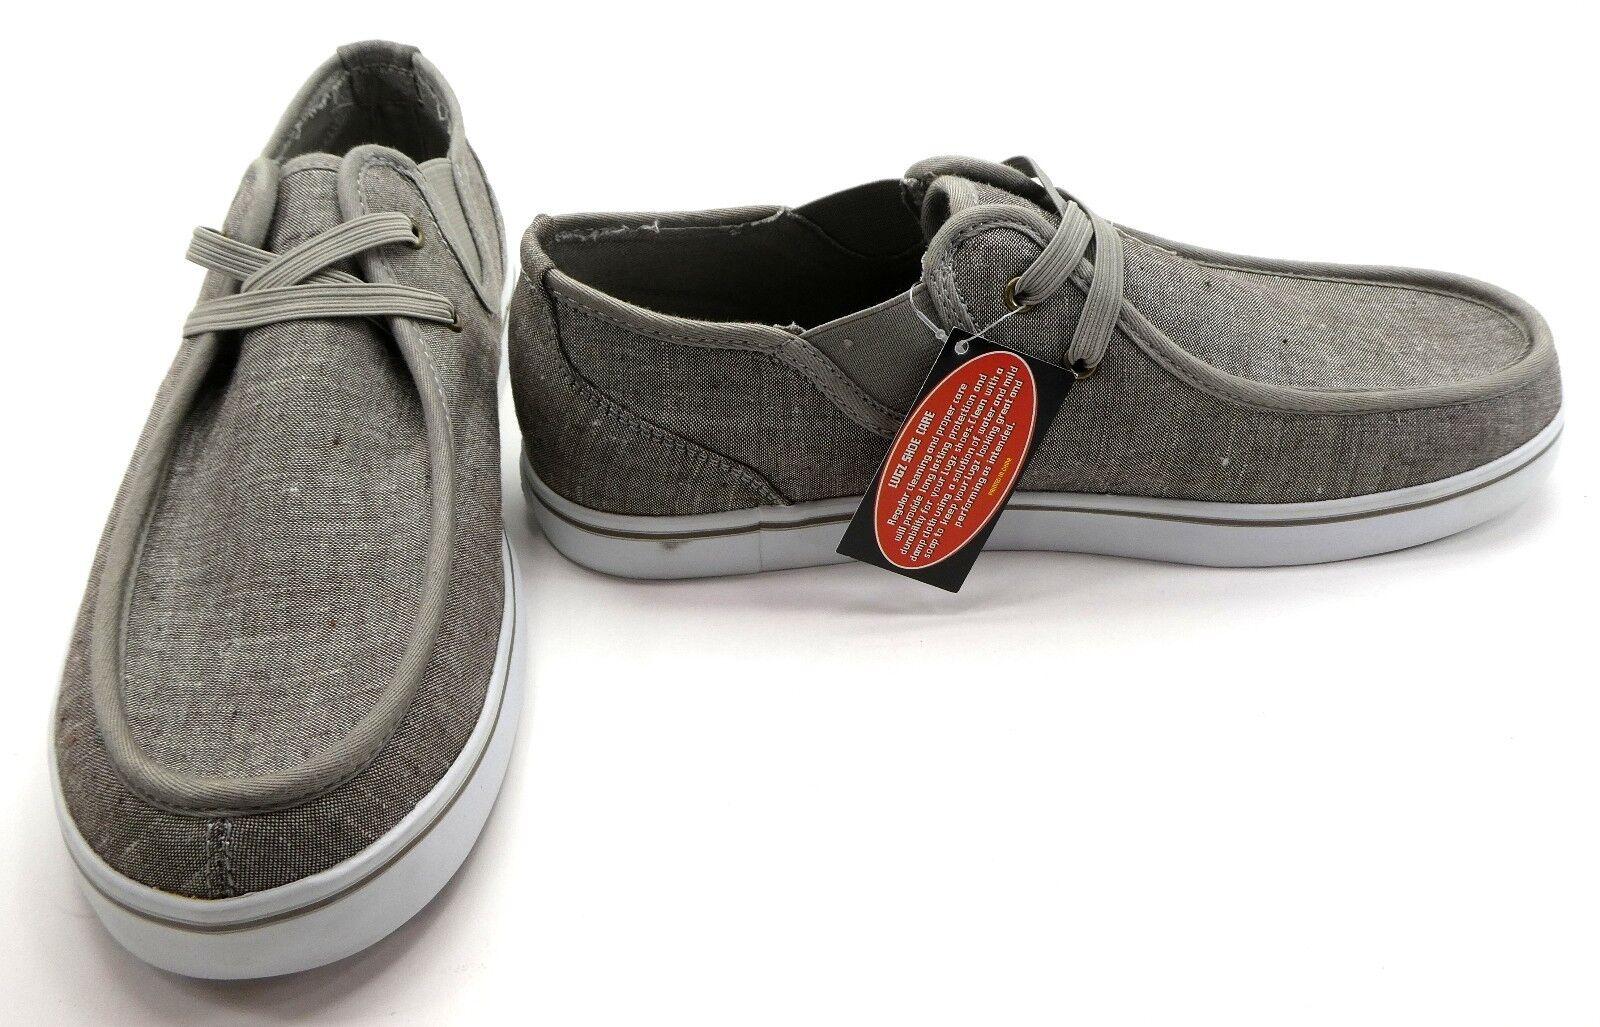 Lugz Shoes Sparks Lo Slip On Laceless Denim Stone Grey  Size 9